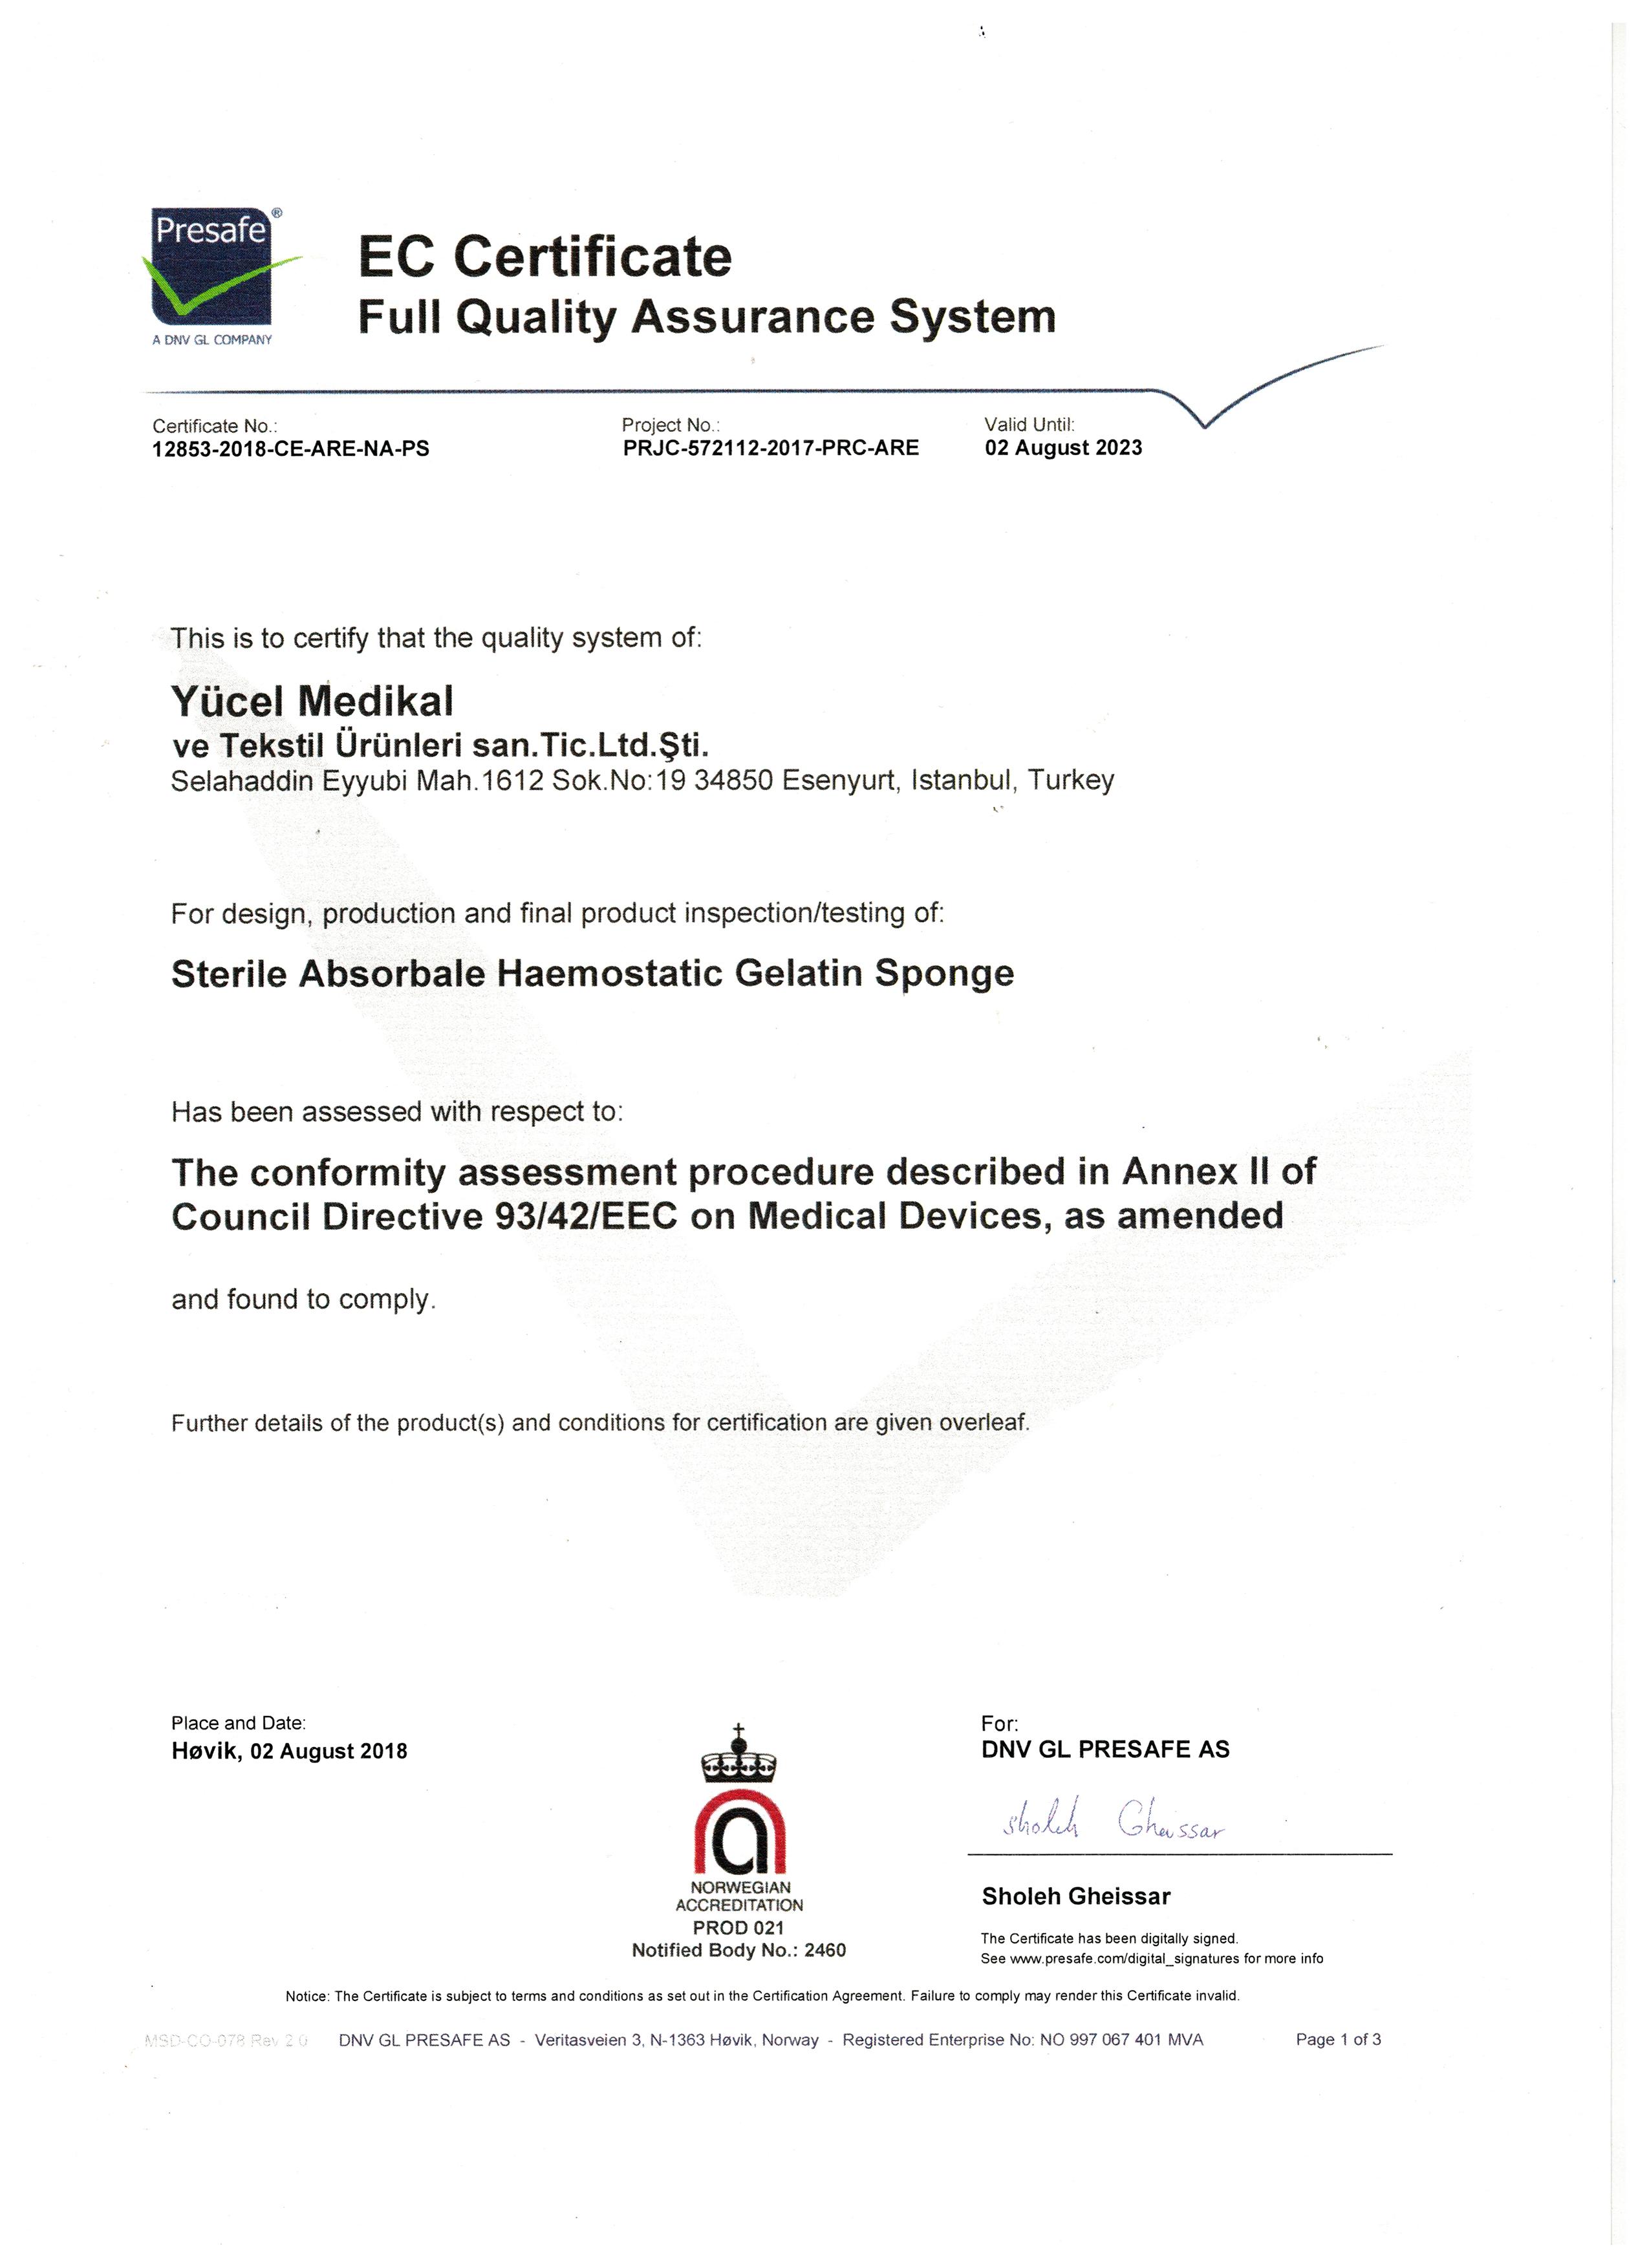 CLİNİSPONGE EC CERTİFİCATE FULL QALİTY ASSURANCE SYSTEM -1